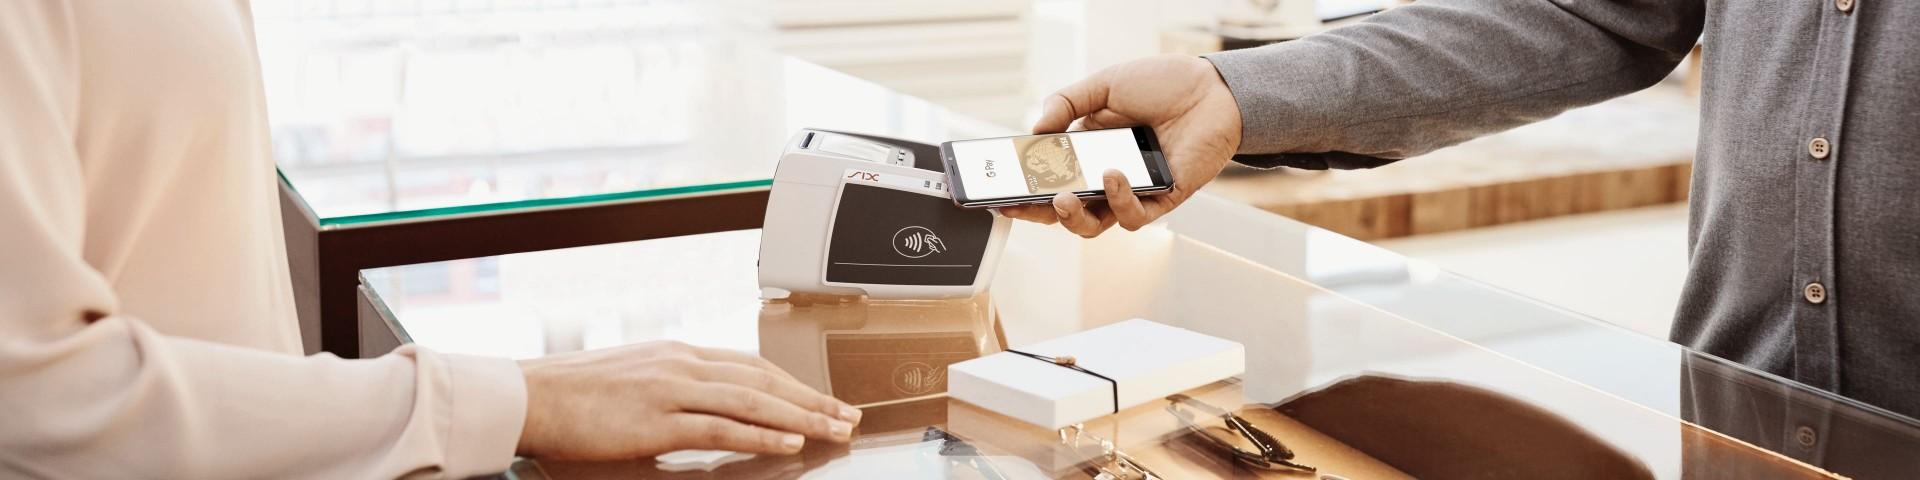 Bonuscard Google Pay